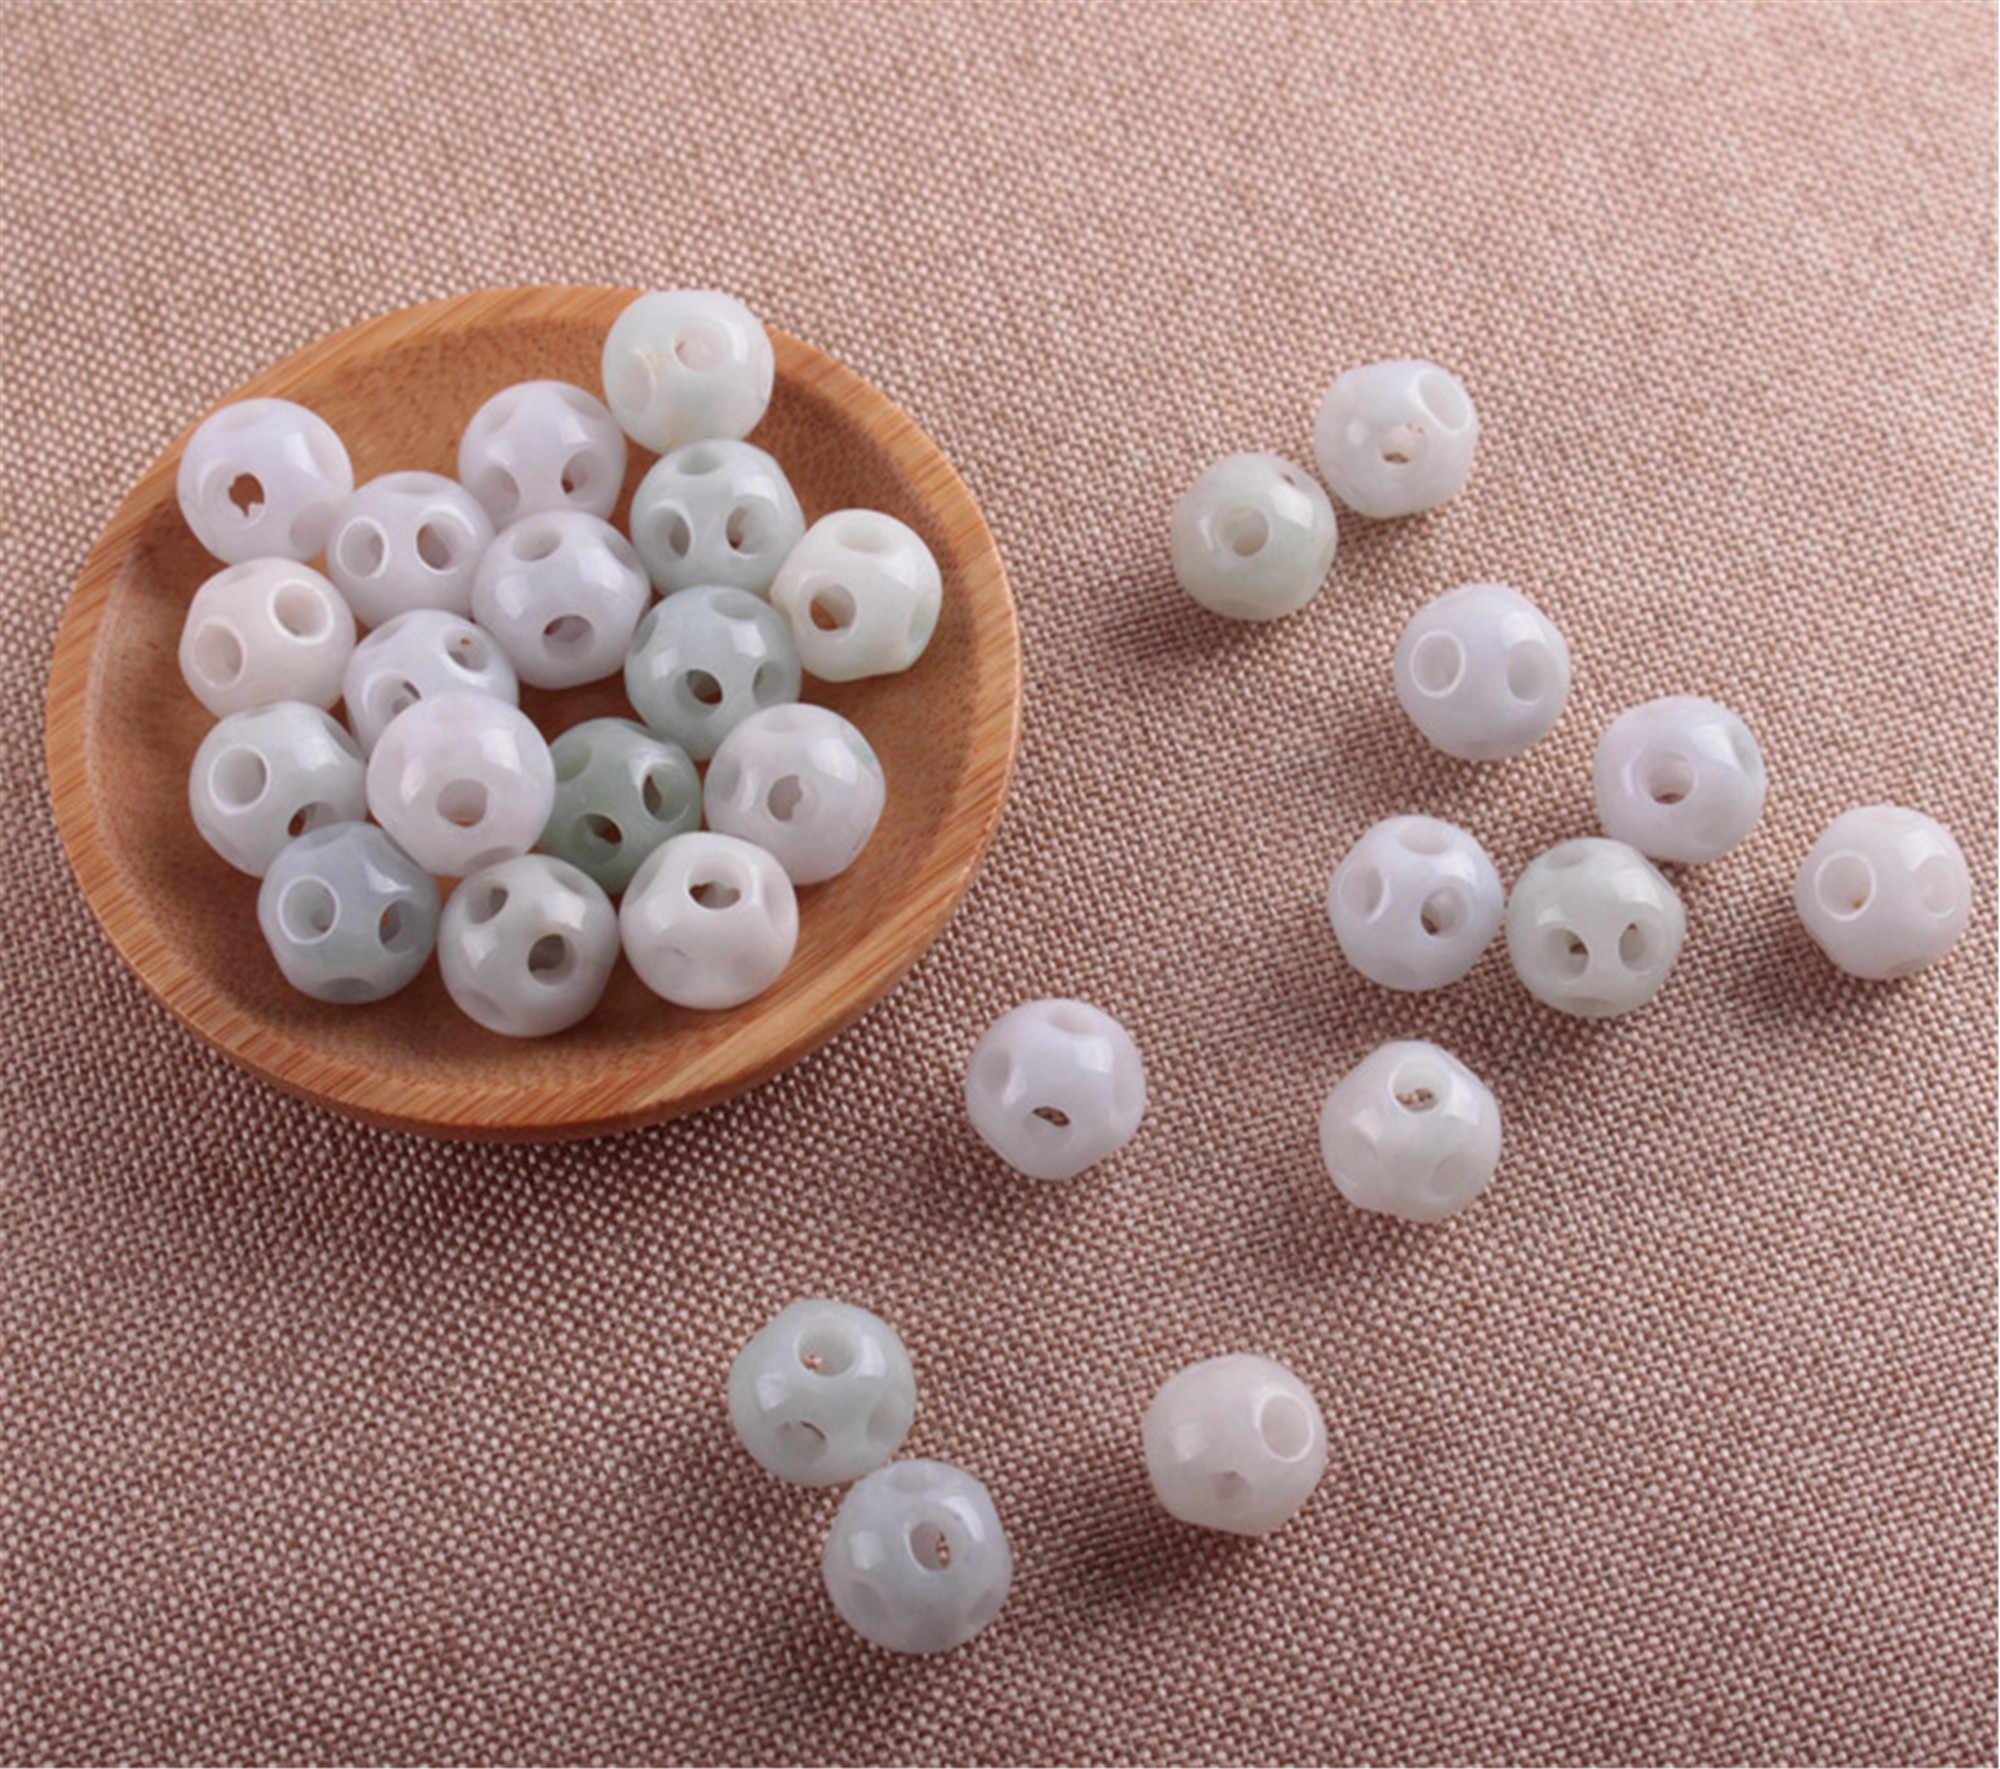 Atacado 10 pçs lote para 13mm grau natural a jade grânulos foodball forma birmânia jadeite baed diy colar verde jadeit jóias presente